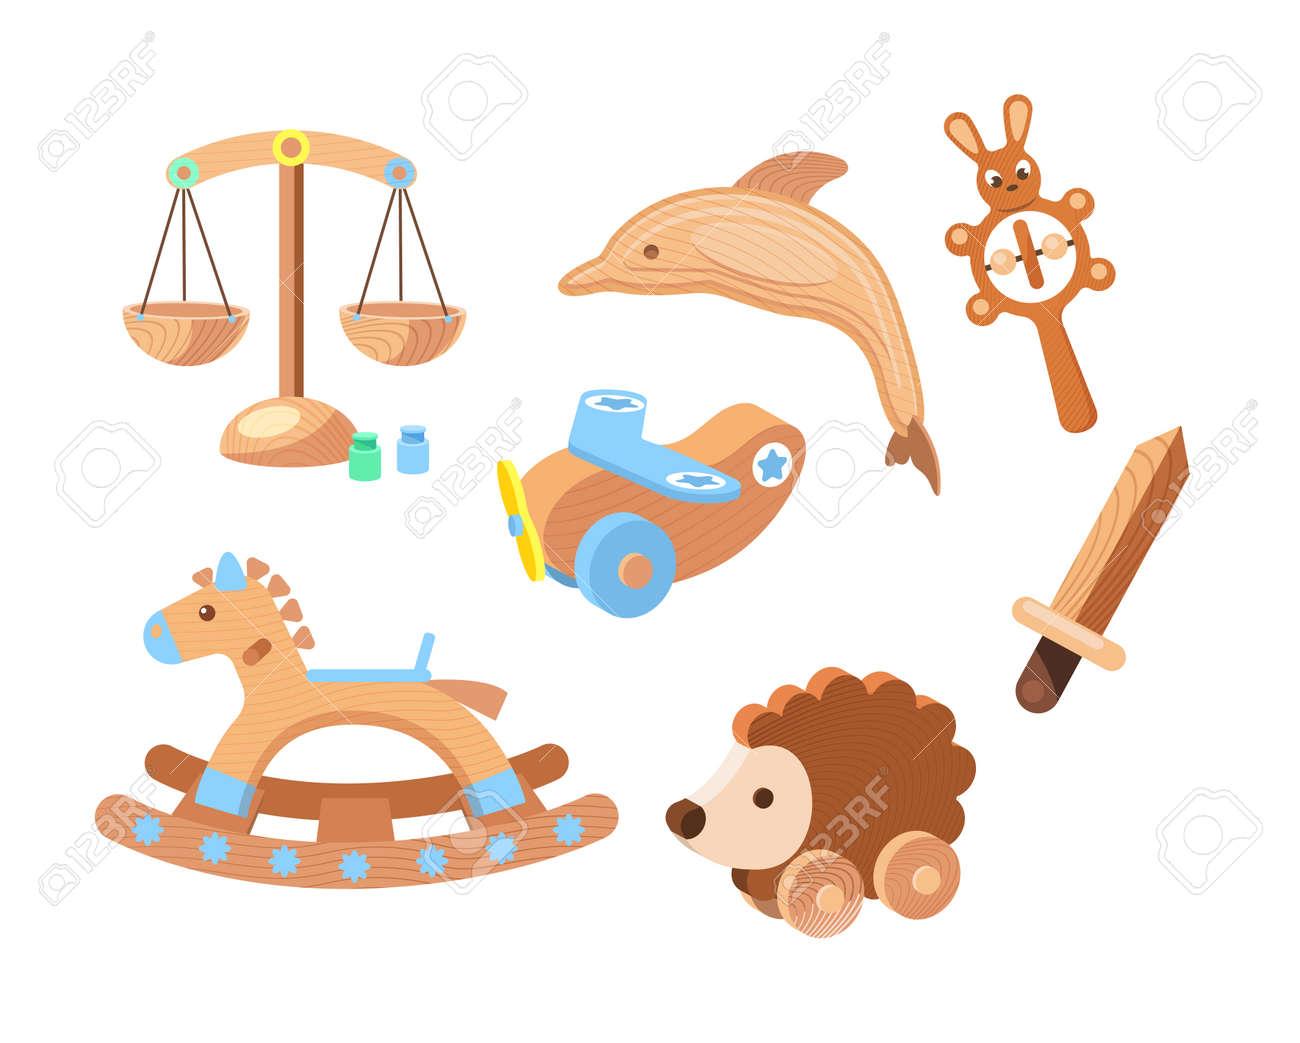 Vintage wooden toys set. Toys for children made of wood bears, plane, sword, hedgehog educational, puzzle, dog - 146818674